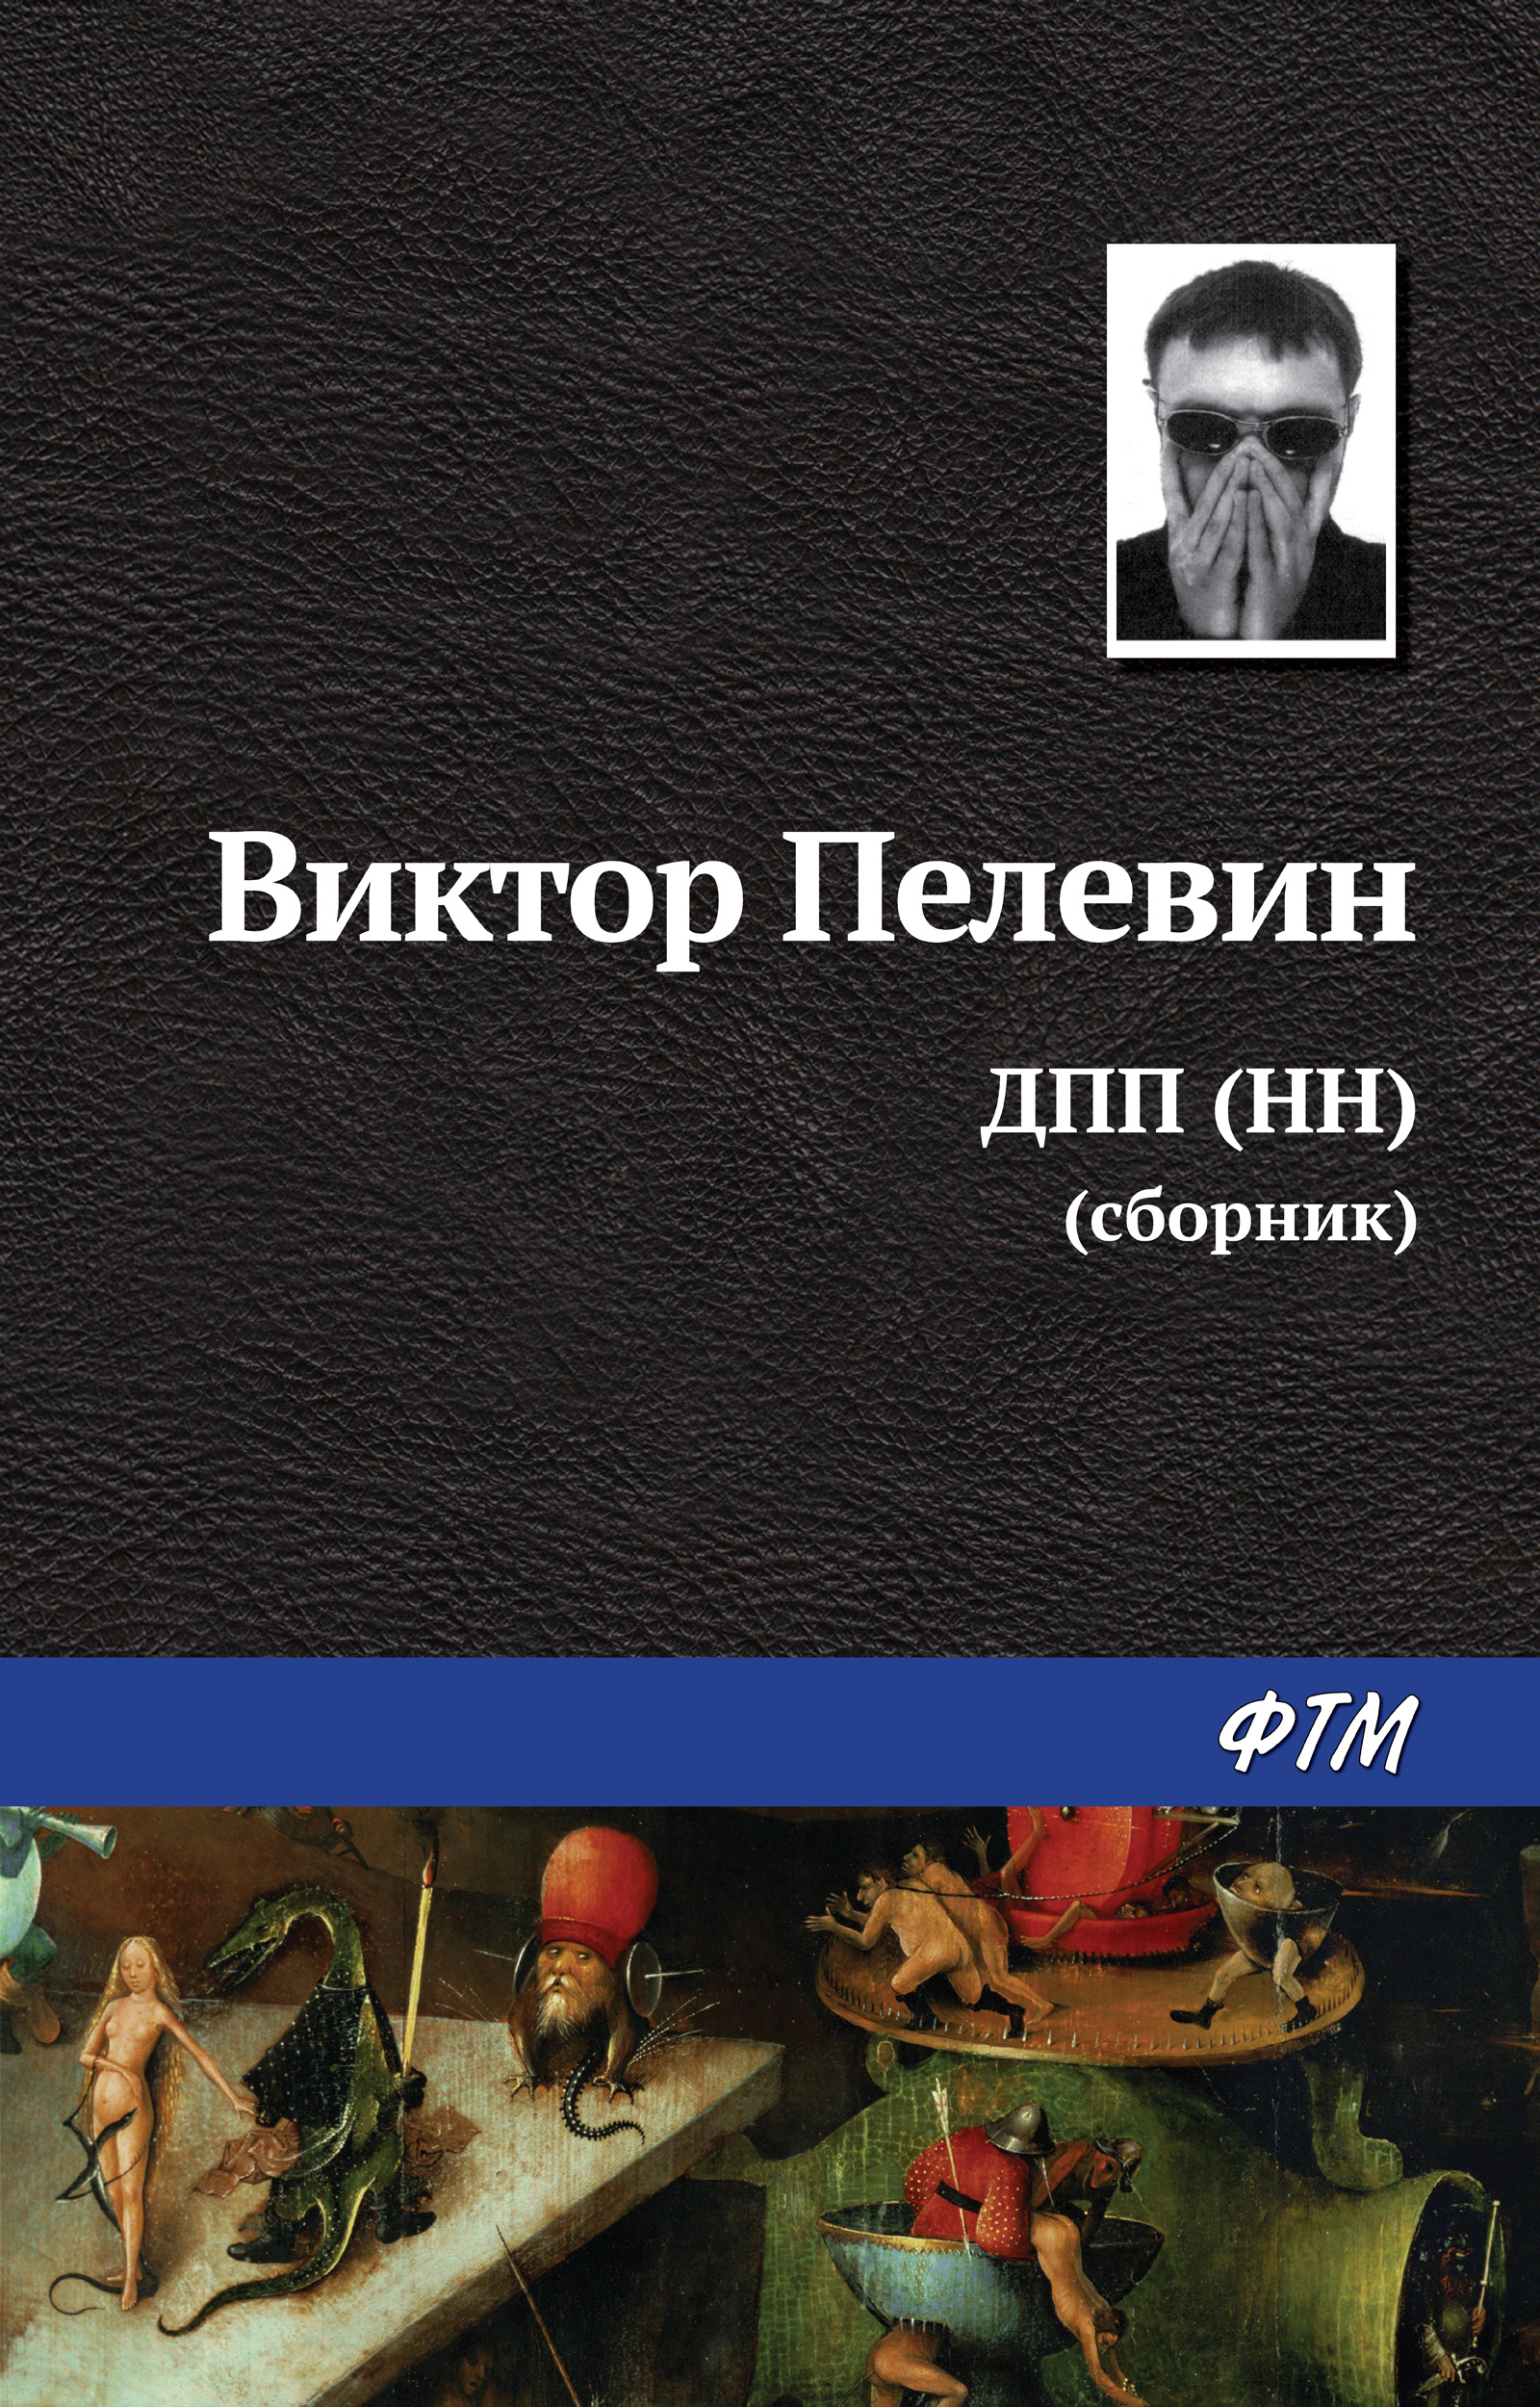 ДПП (НН) (сборник)